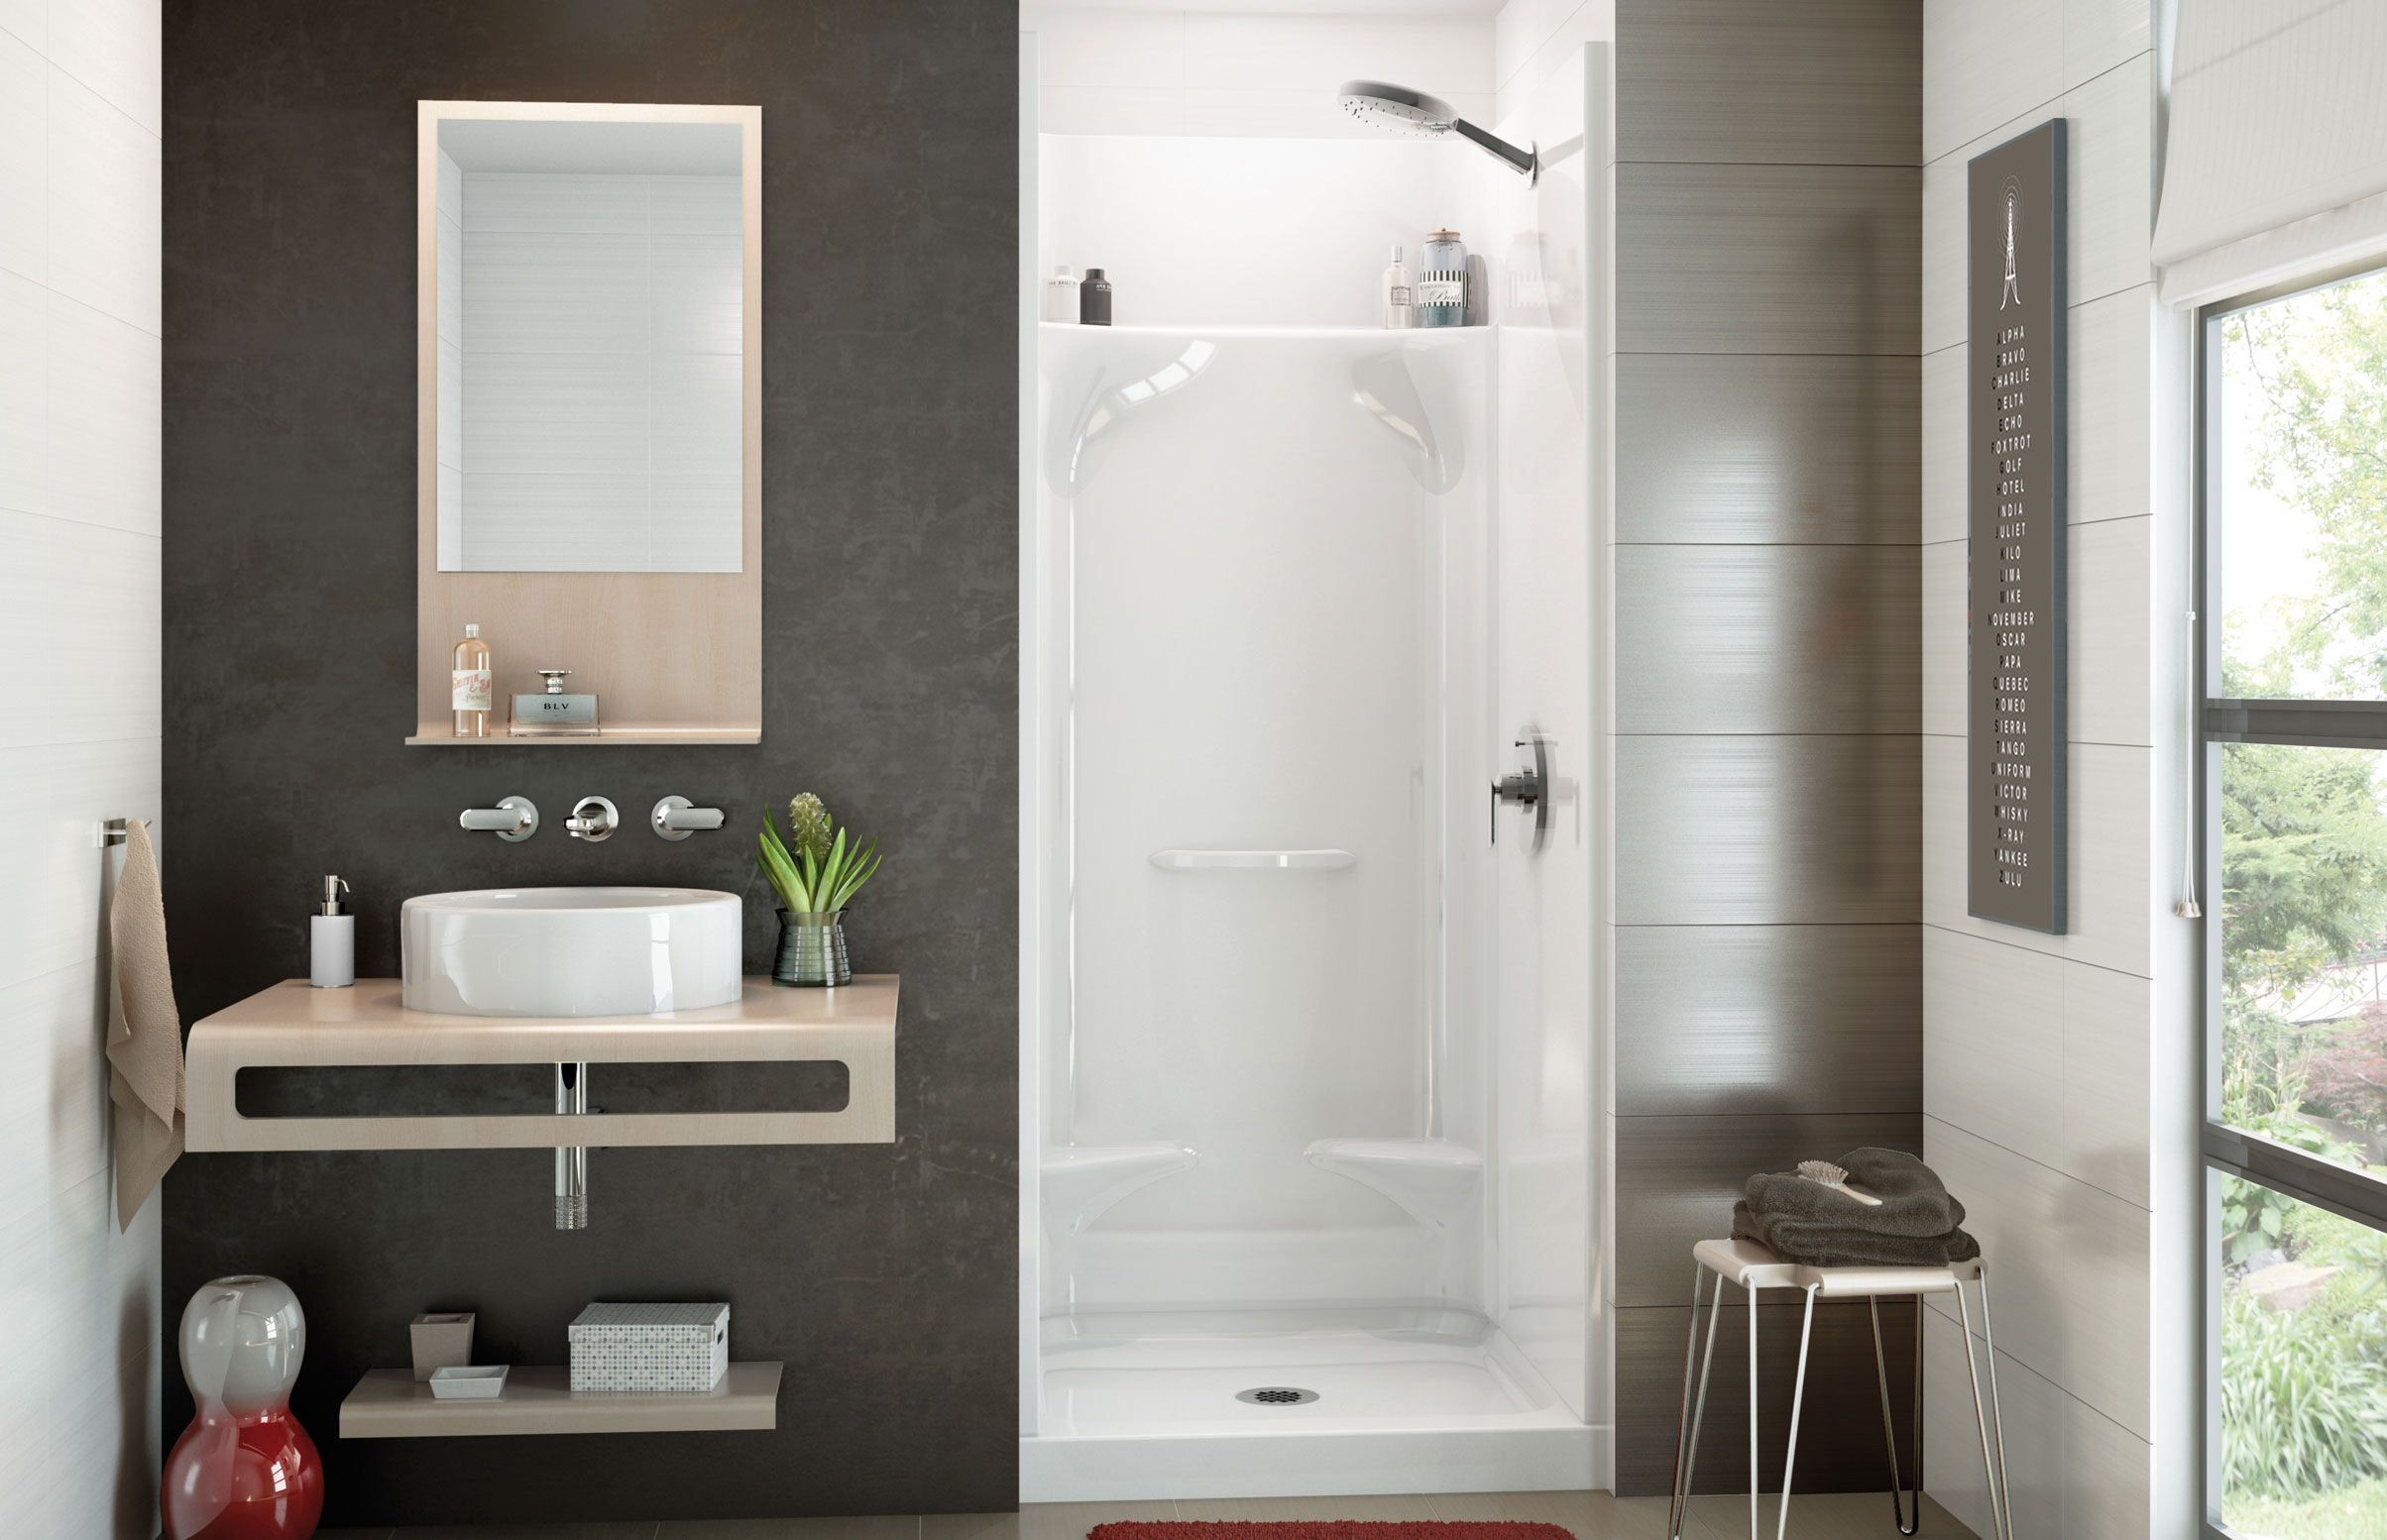 Essence Sh 3232 Alcove Showers Maax Bath Inc Shower Cabinets Fiberglass Shower Tiny Bathrooms